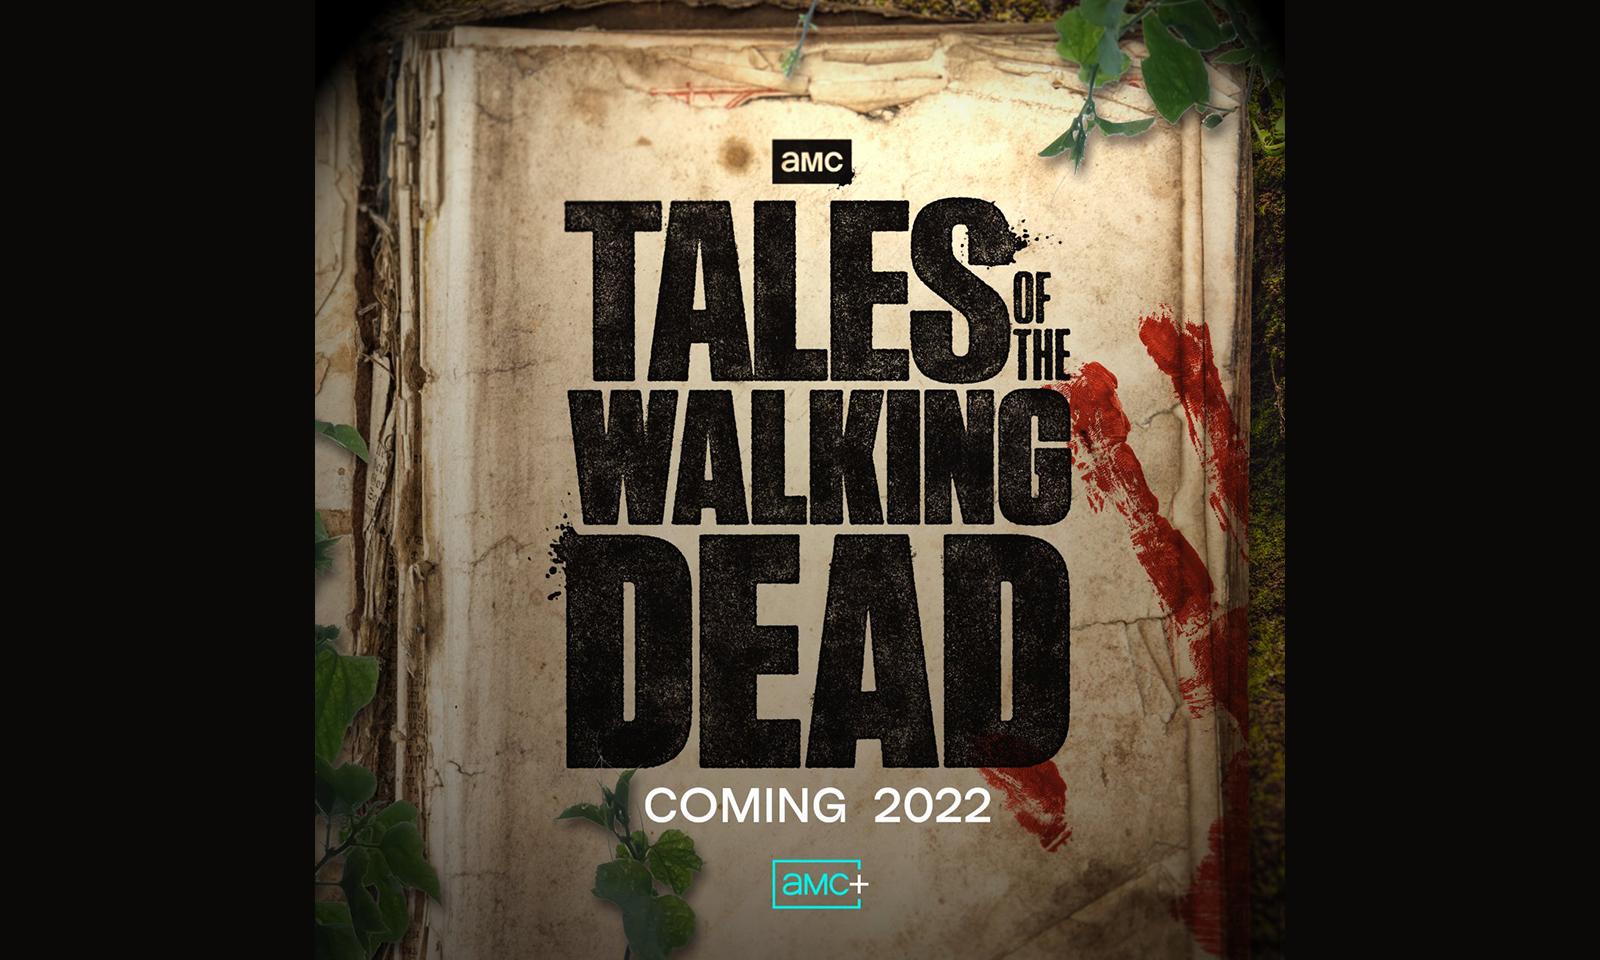 Logo oficial de Tales of the Walking Dead divulgado pelo AMC nas redes sociais.